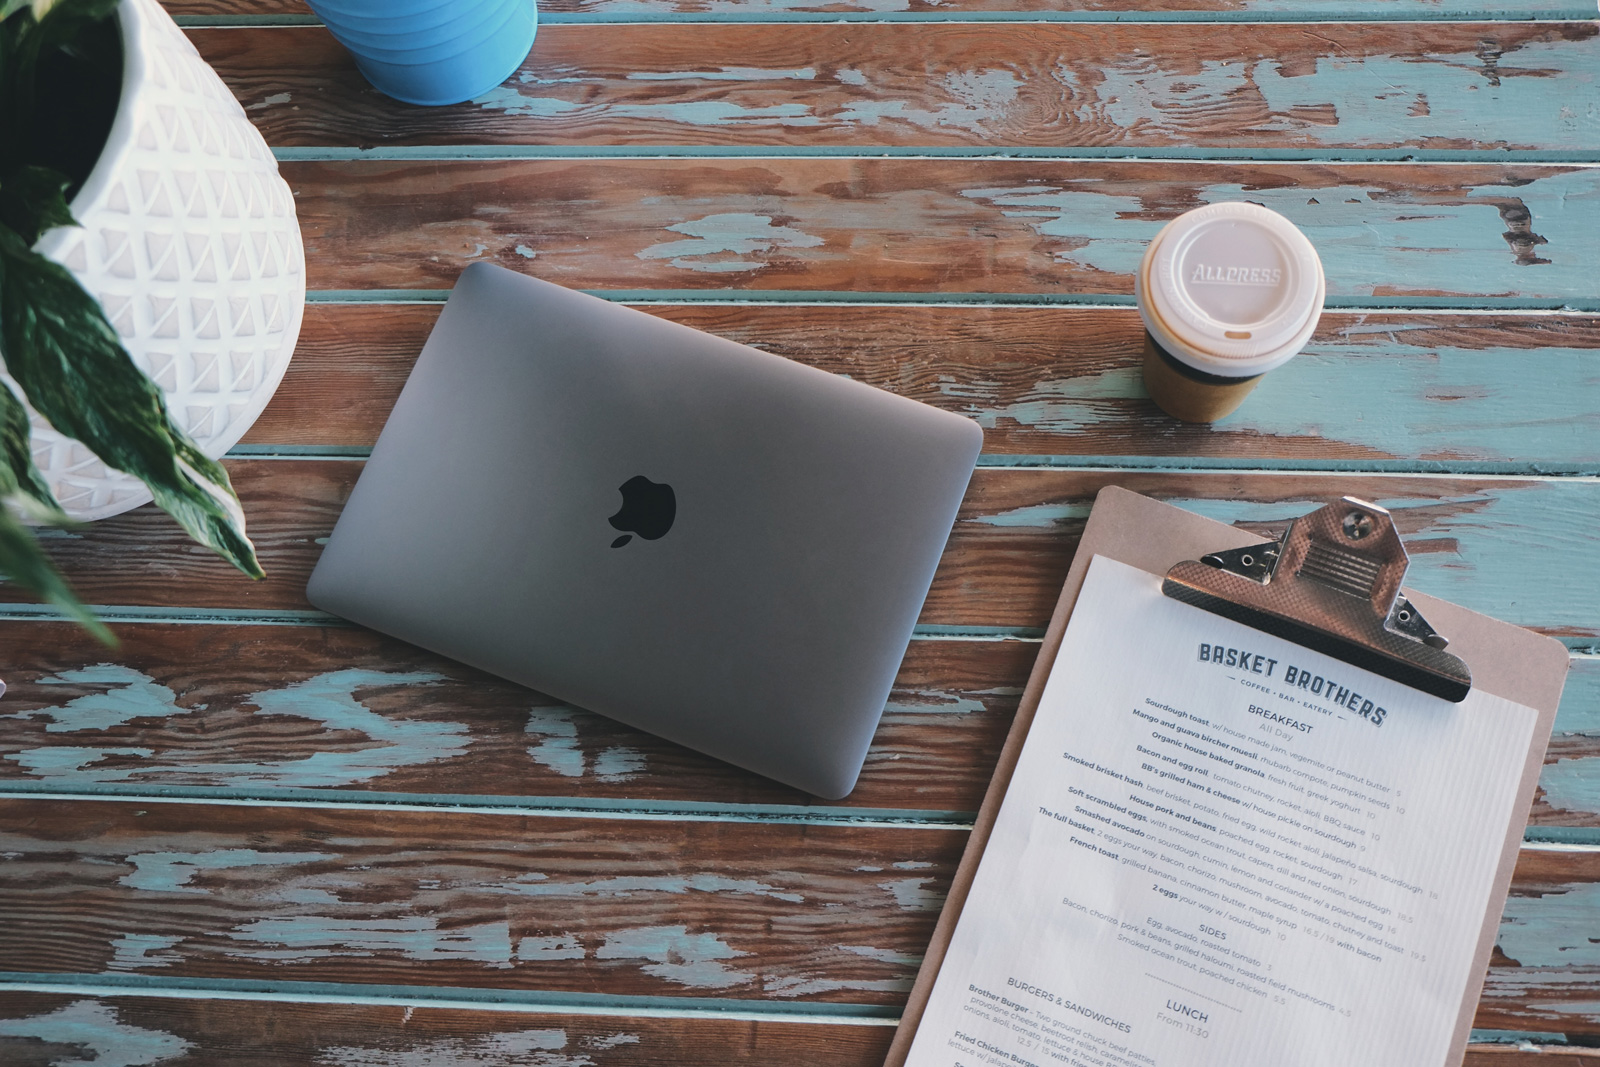 MacBook Space Grey Review